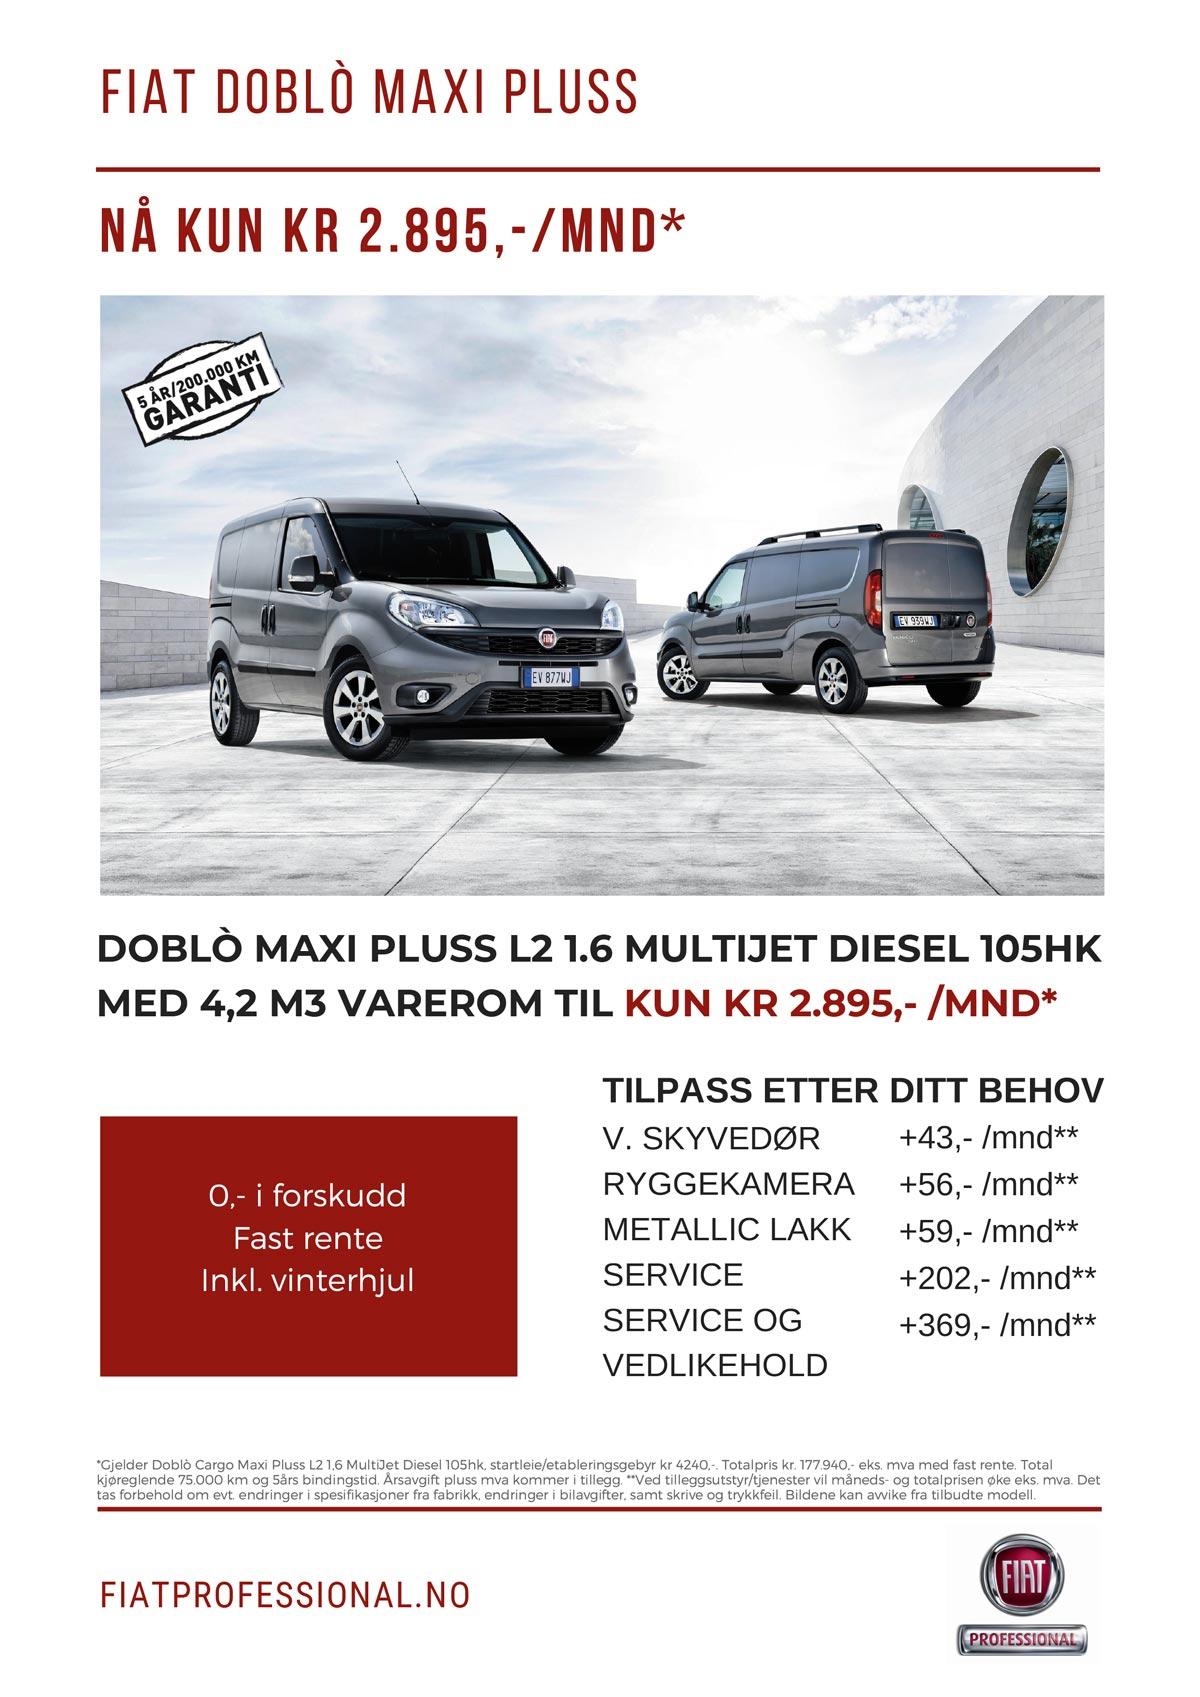 Fiat Doblo maxi pluss